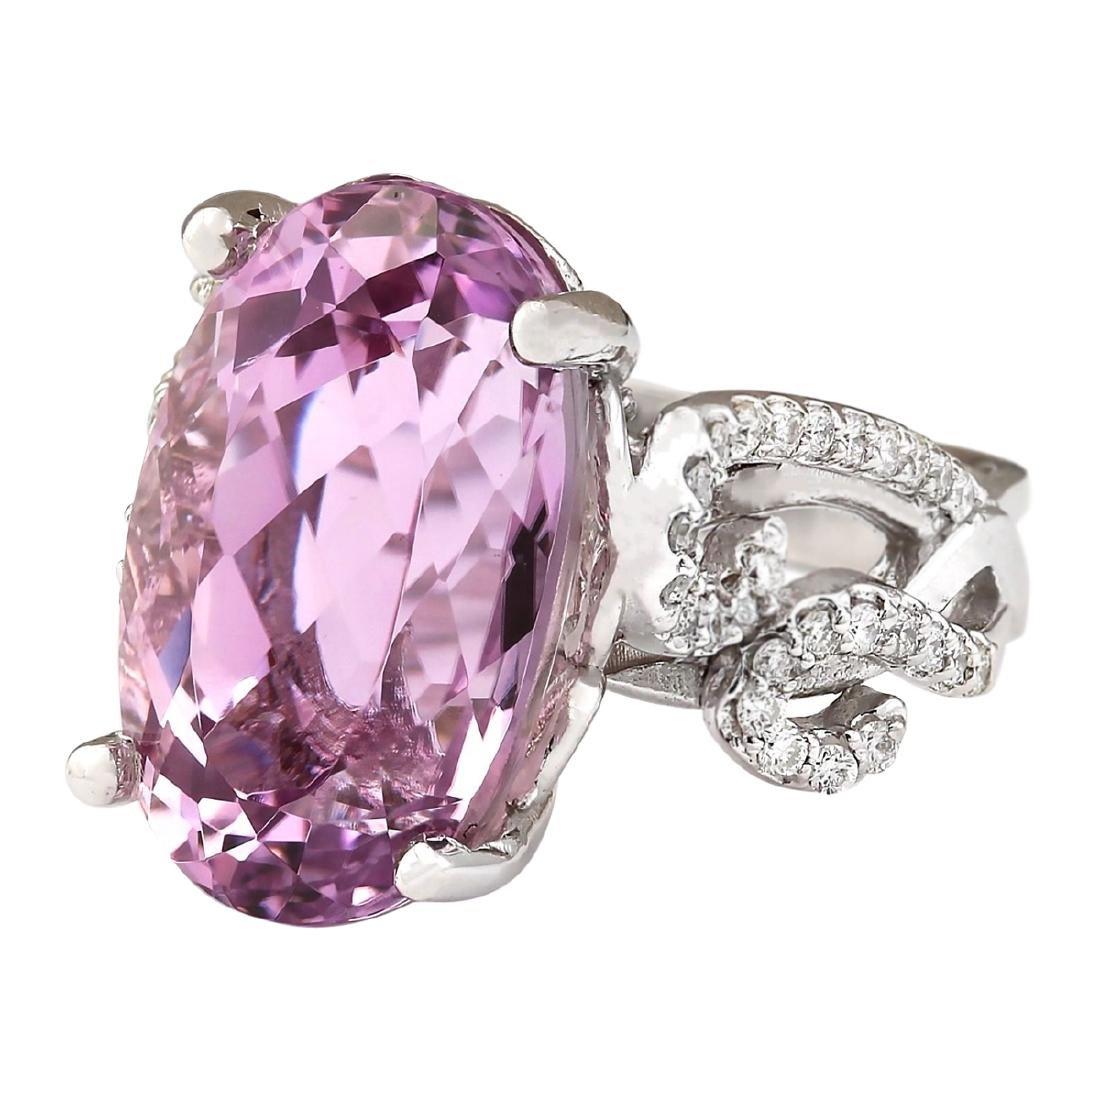 13.86 CTW Natural Kunzite And Diamond Ring In 18K White - 2